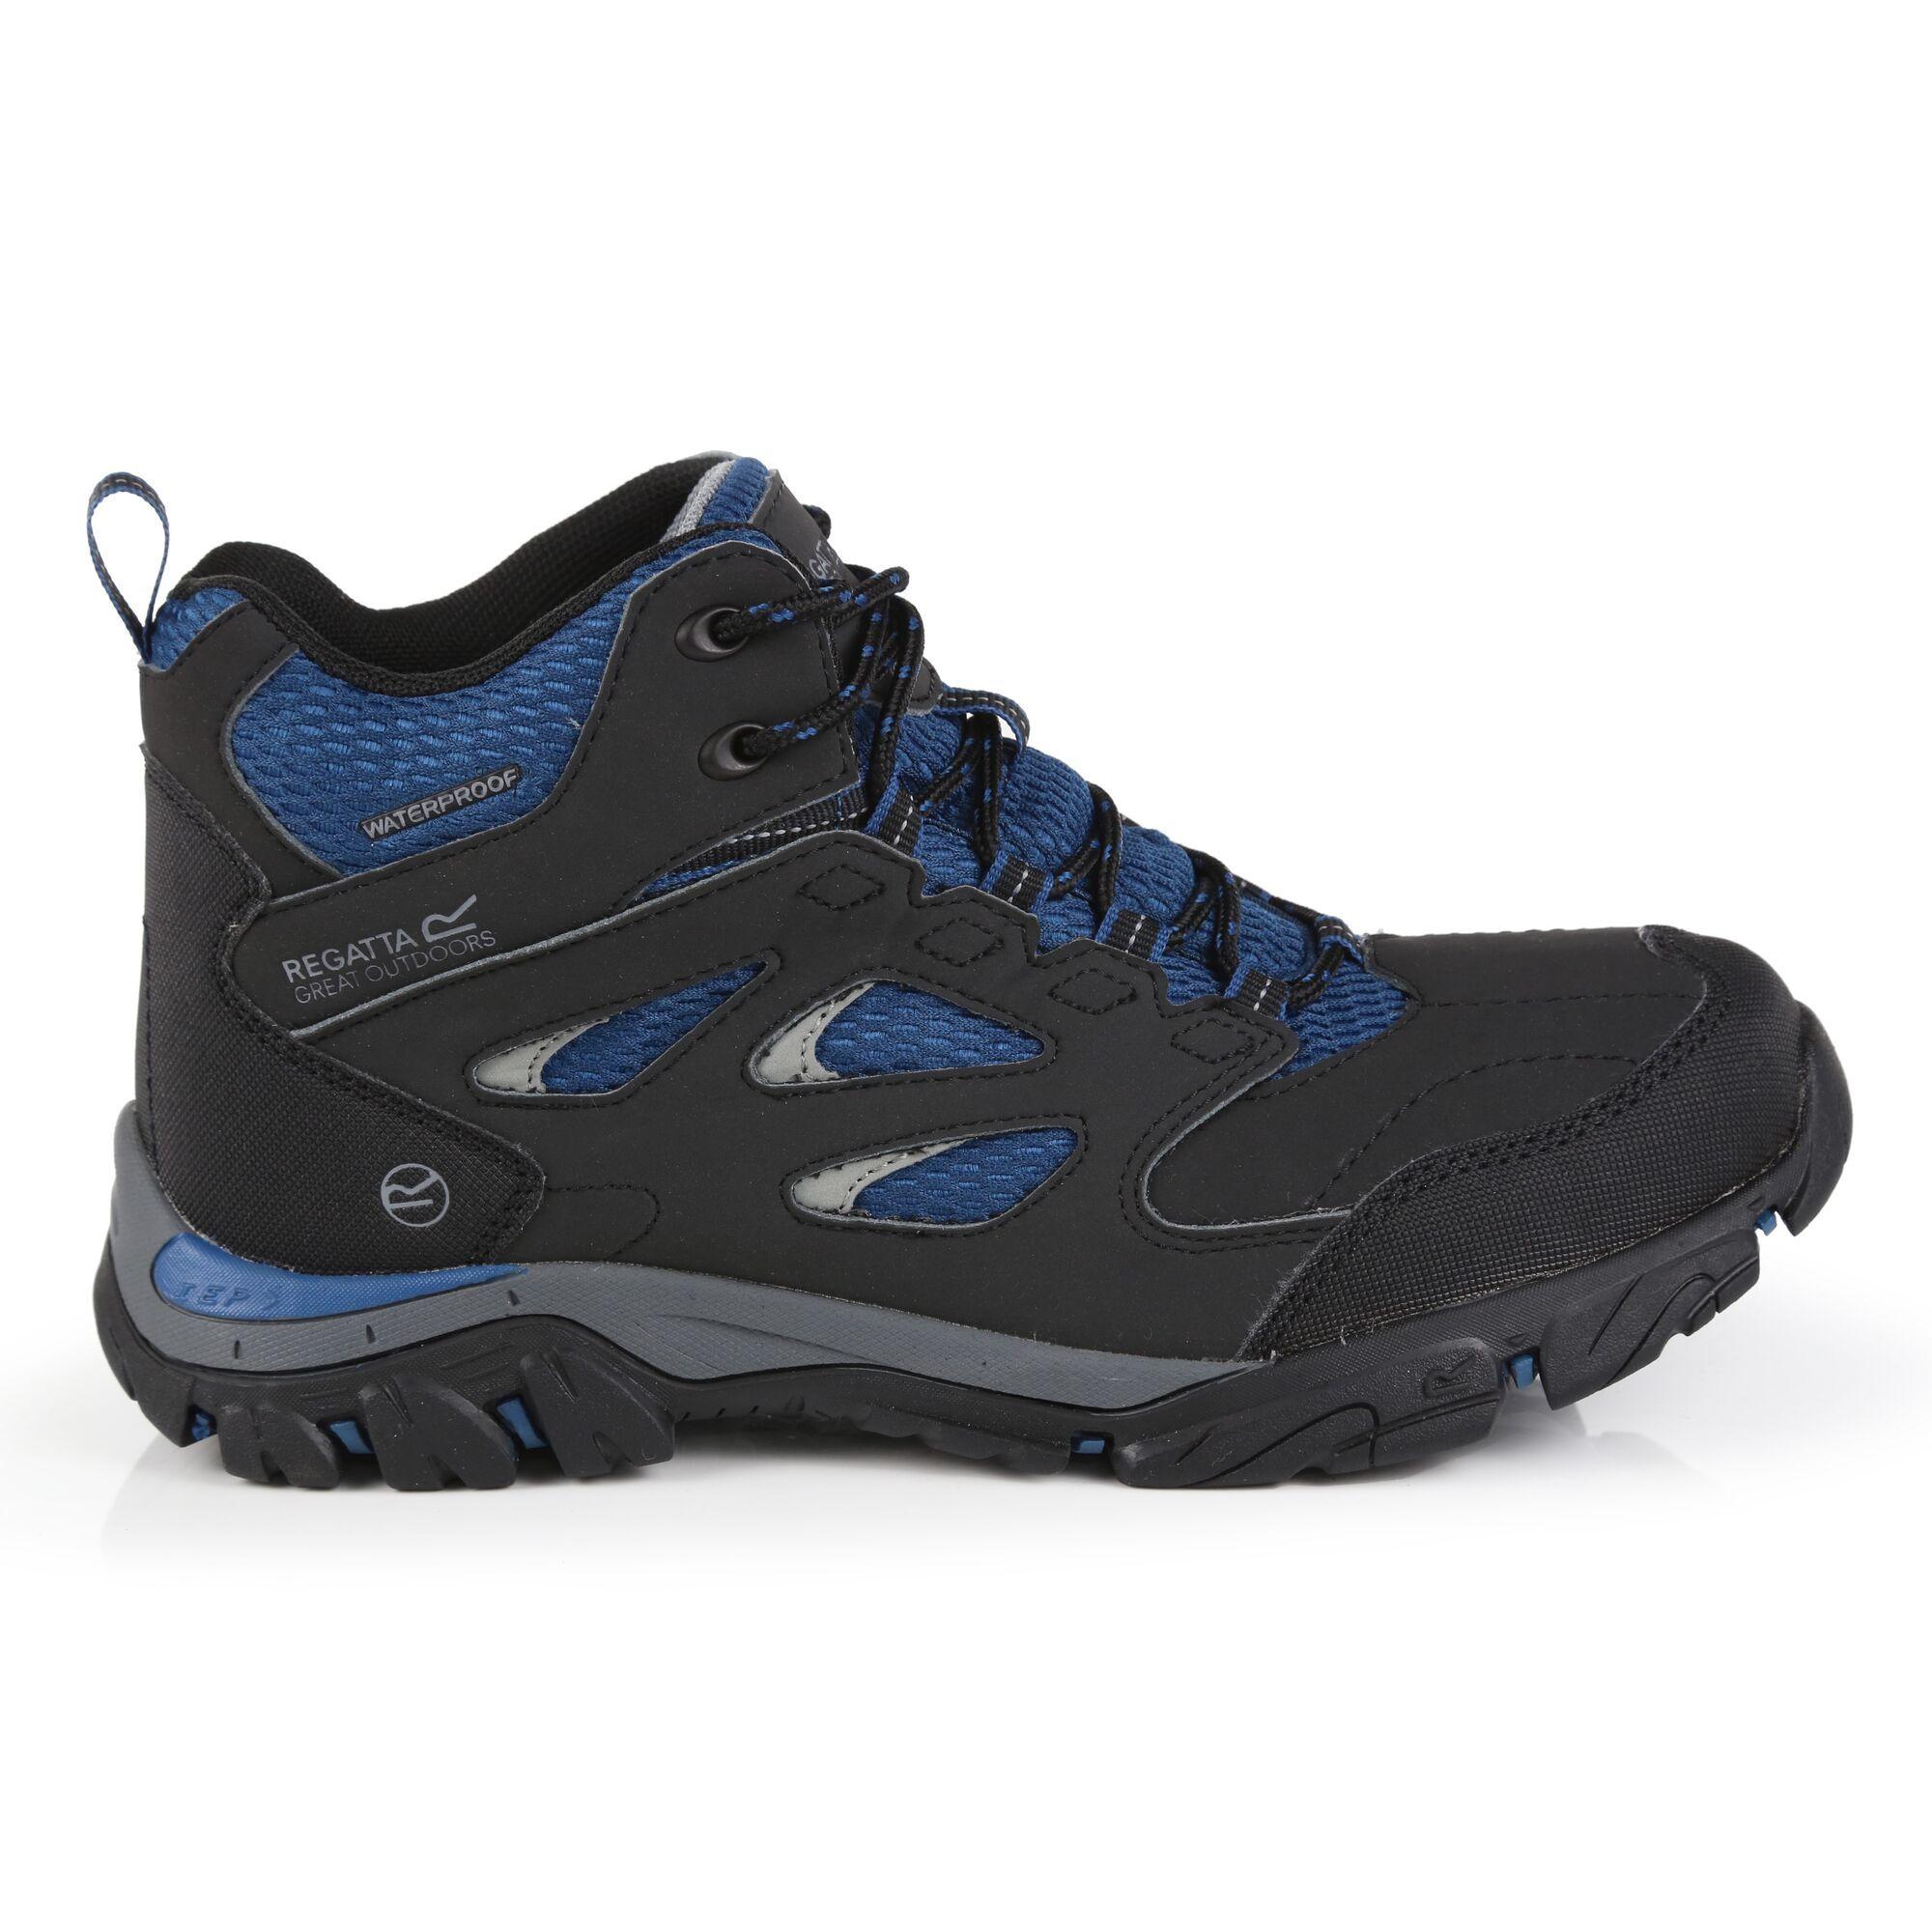 Regatta Womens/Ladies Holcombe IEP Mid Hiking Boots (Ash/Blue Opal)